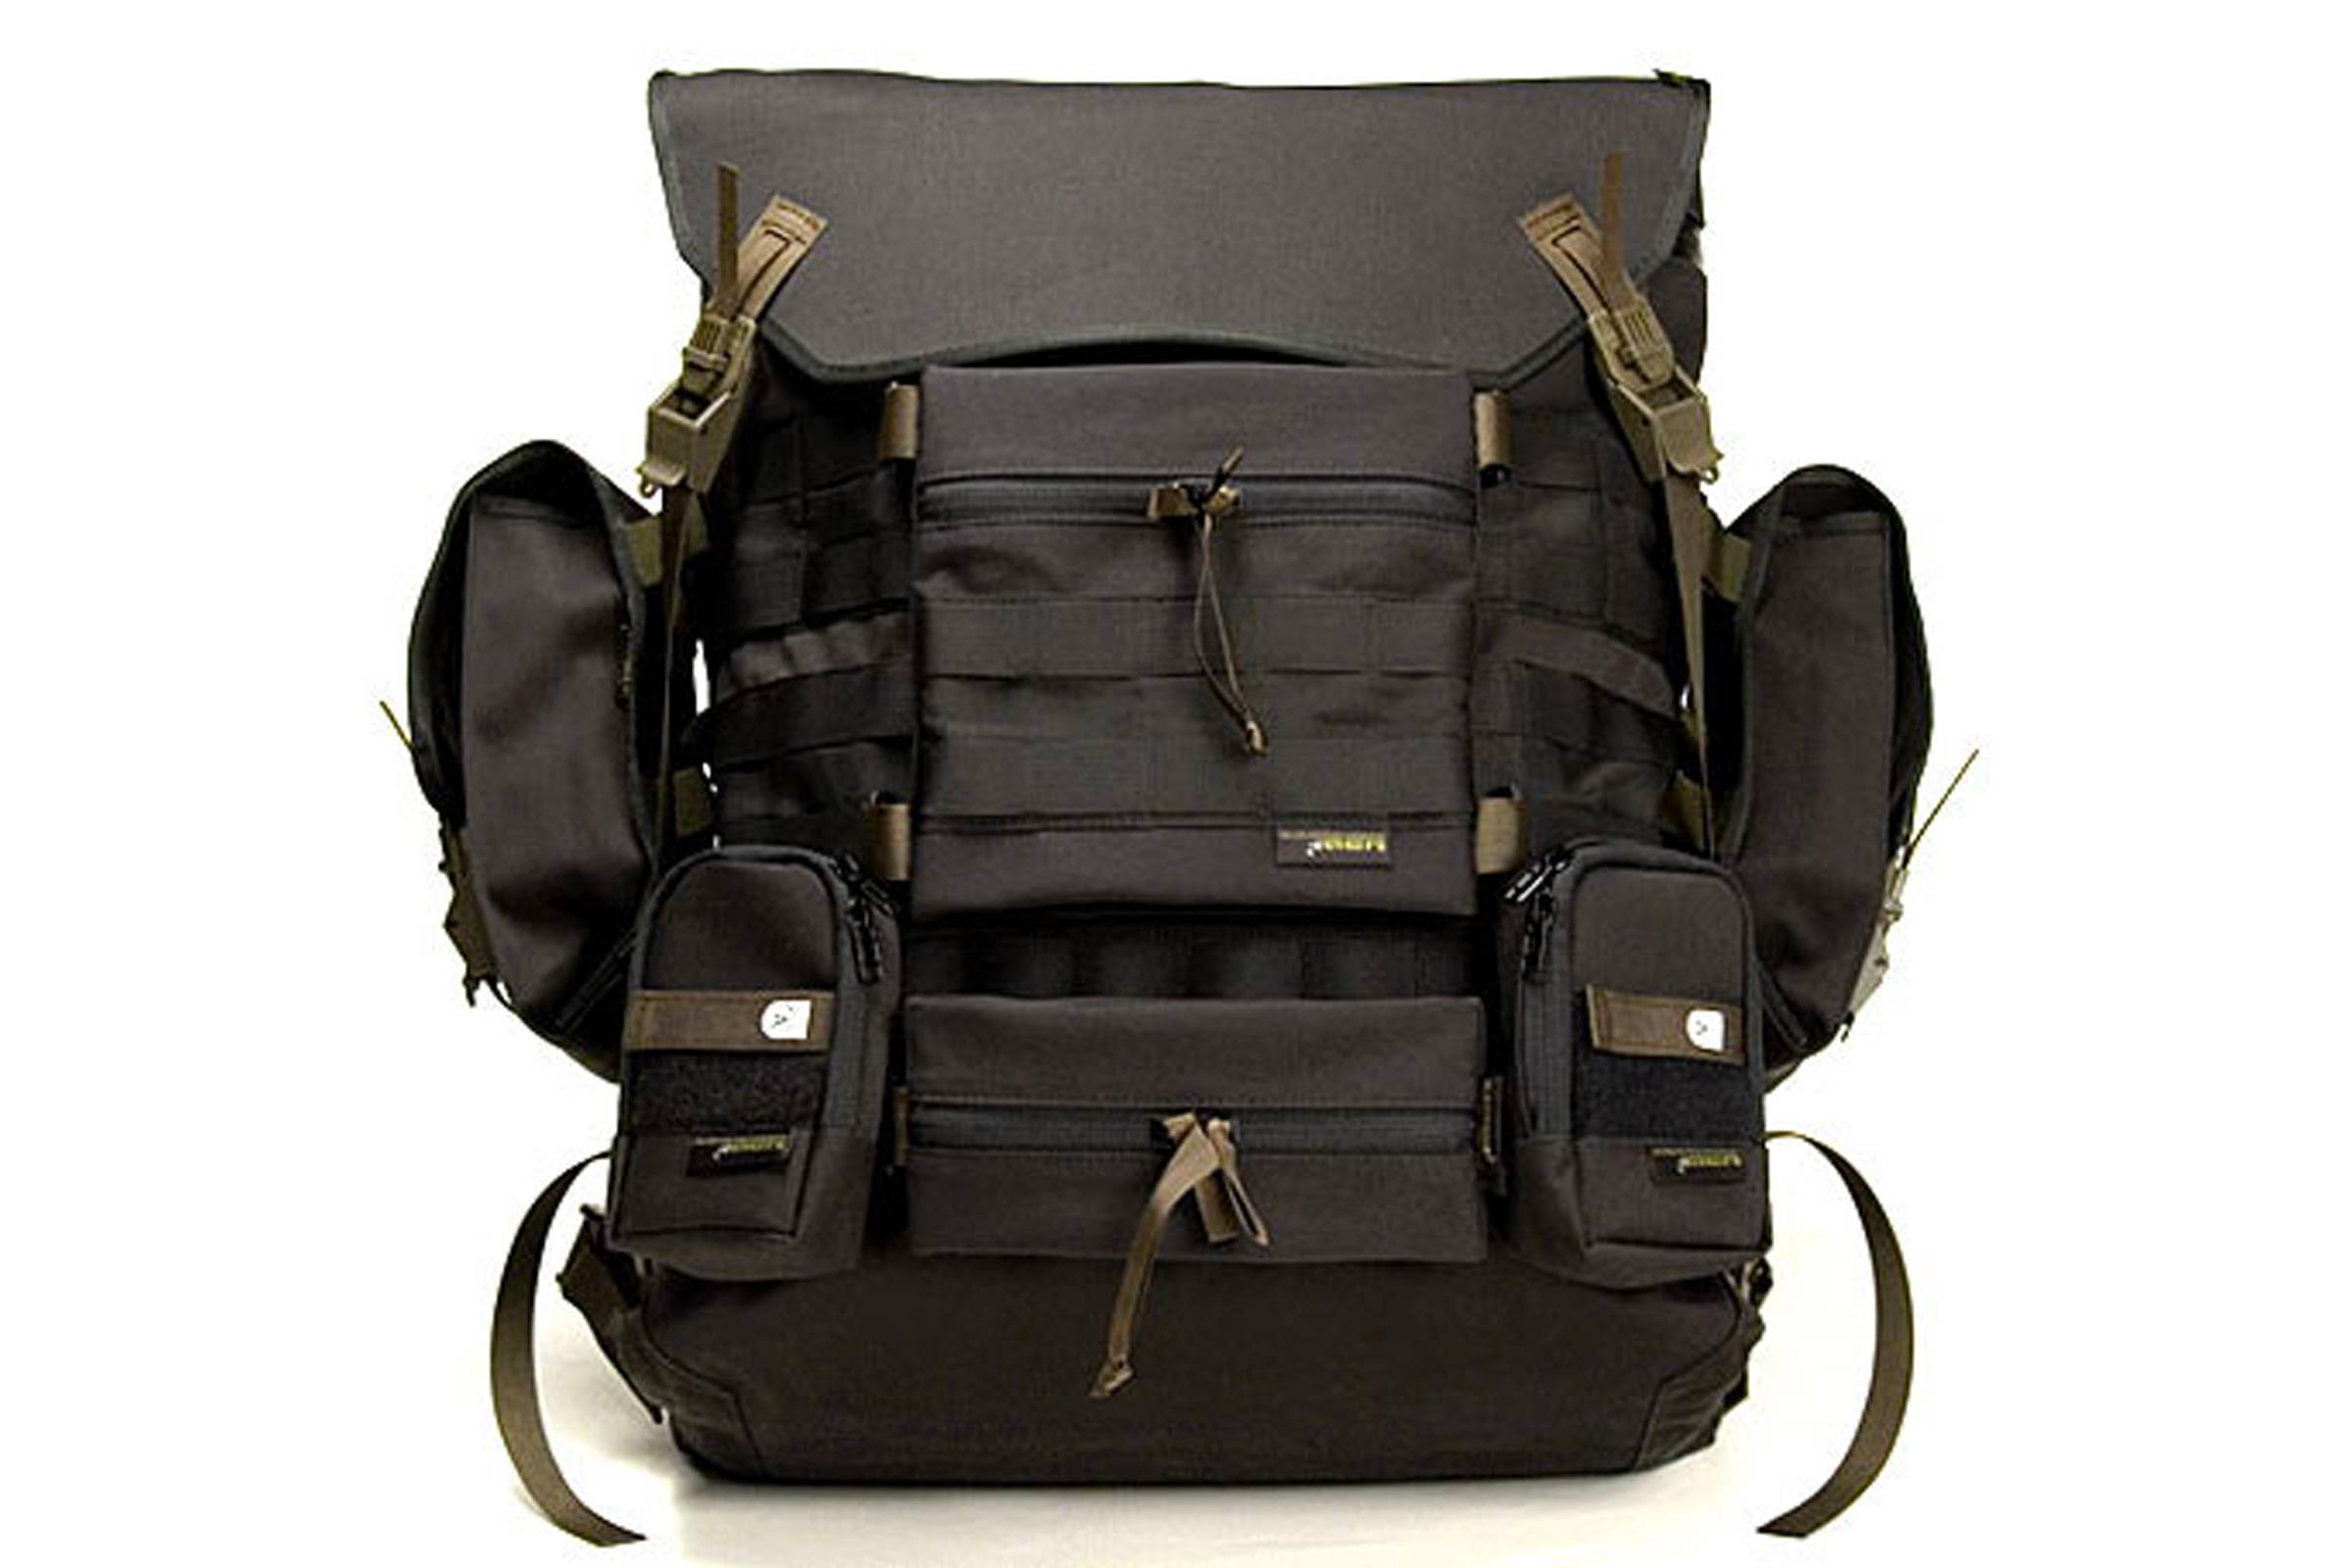 Acronym 3A-7TS Messenger Backpack